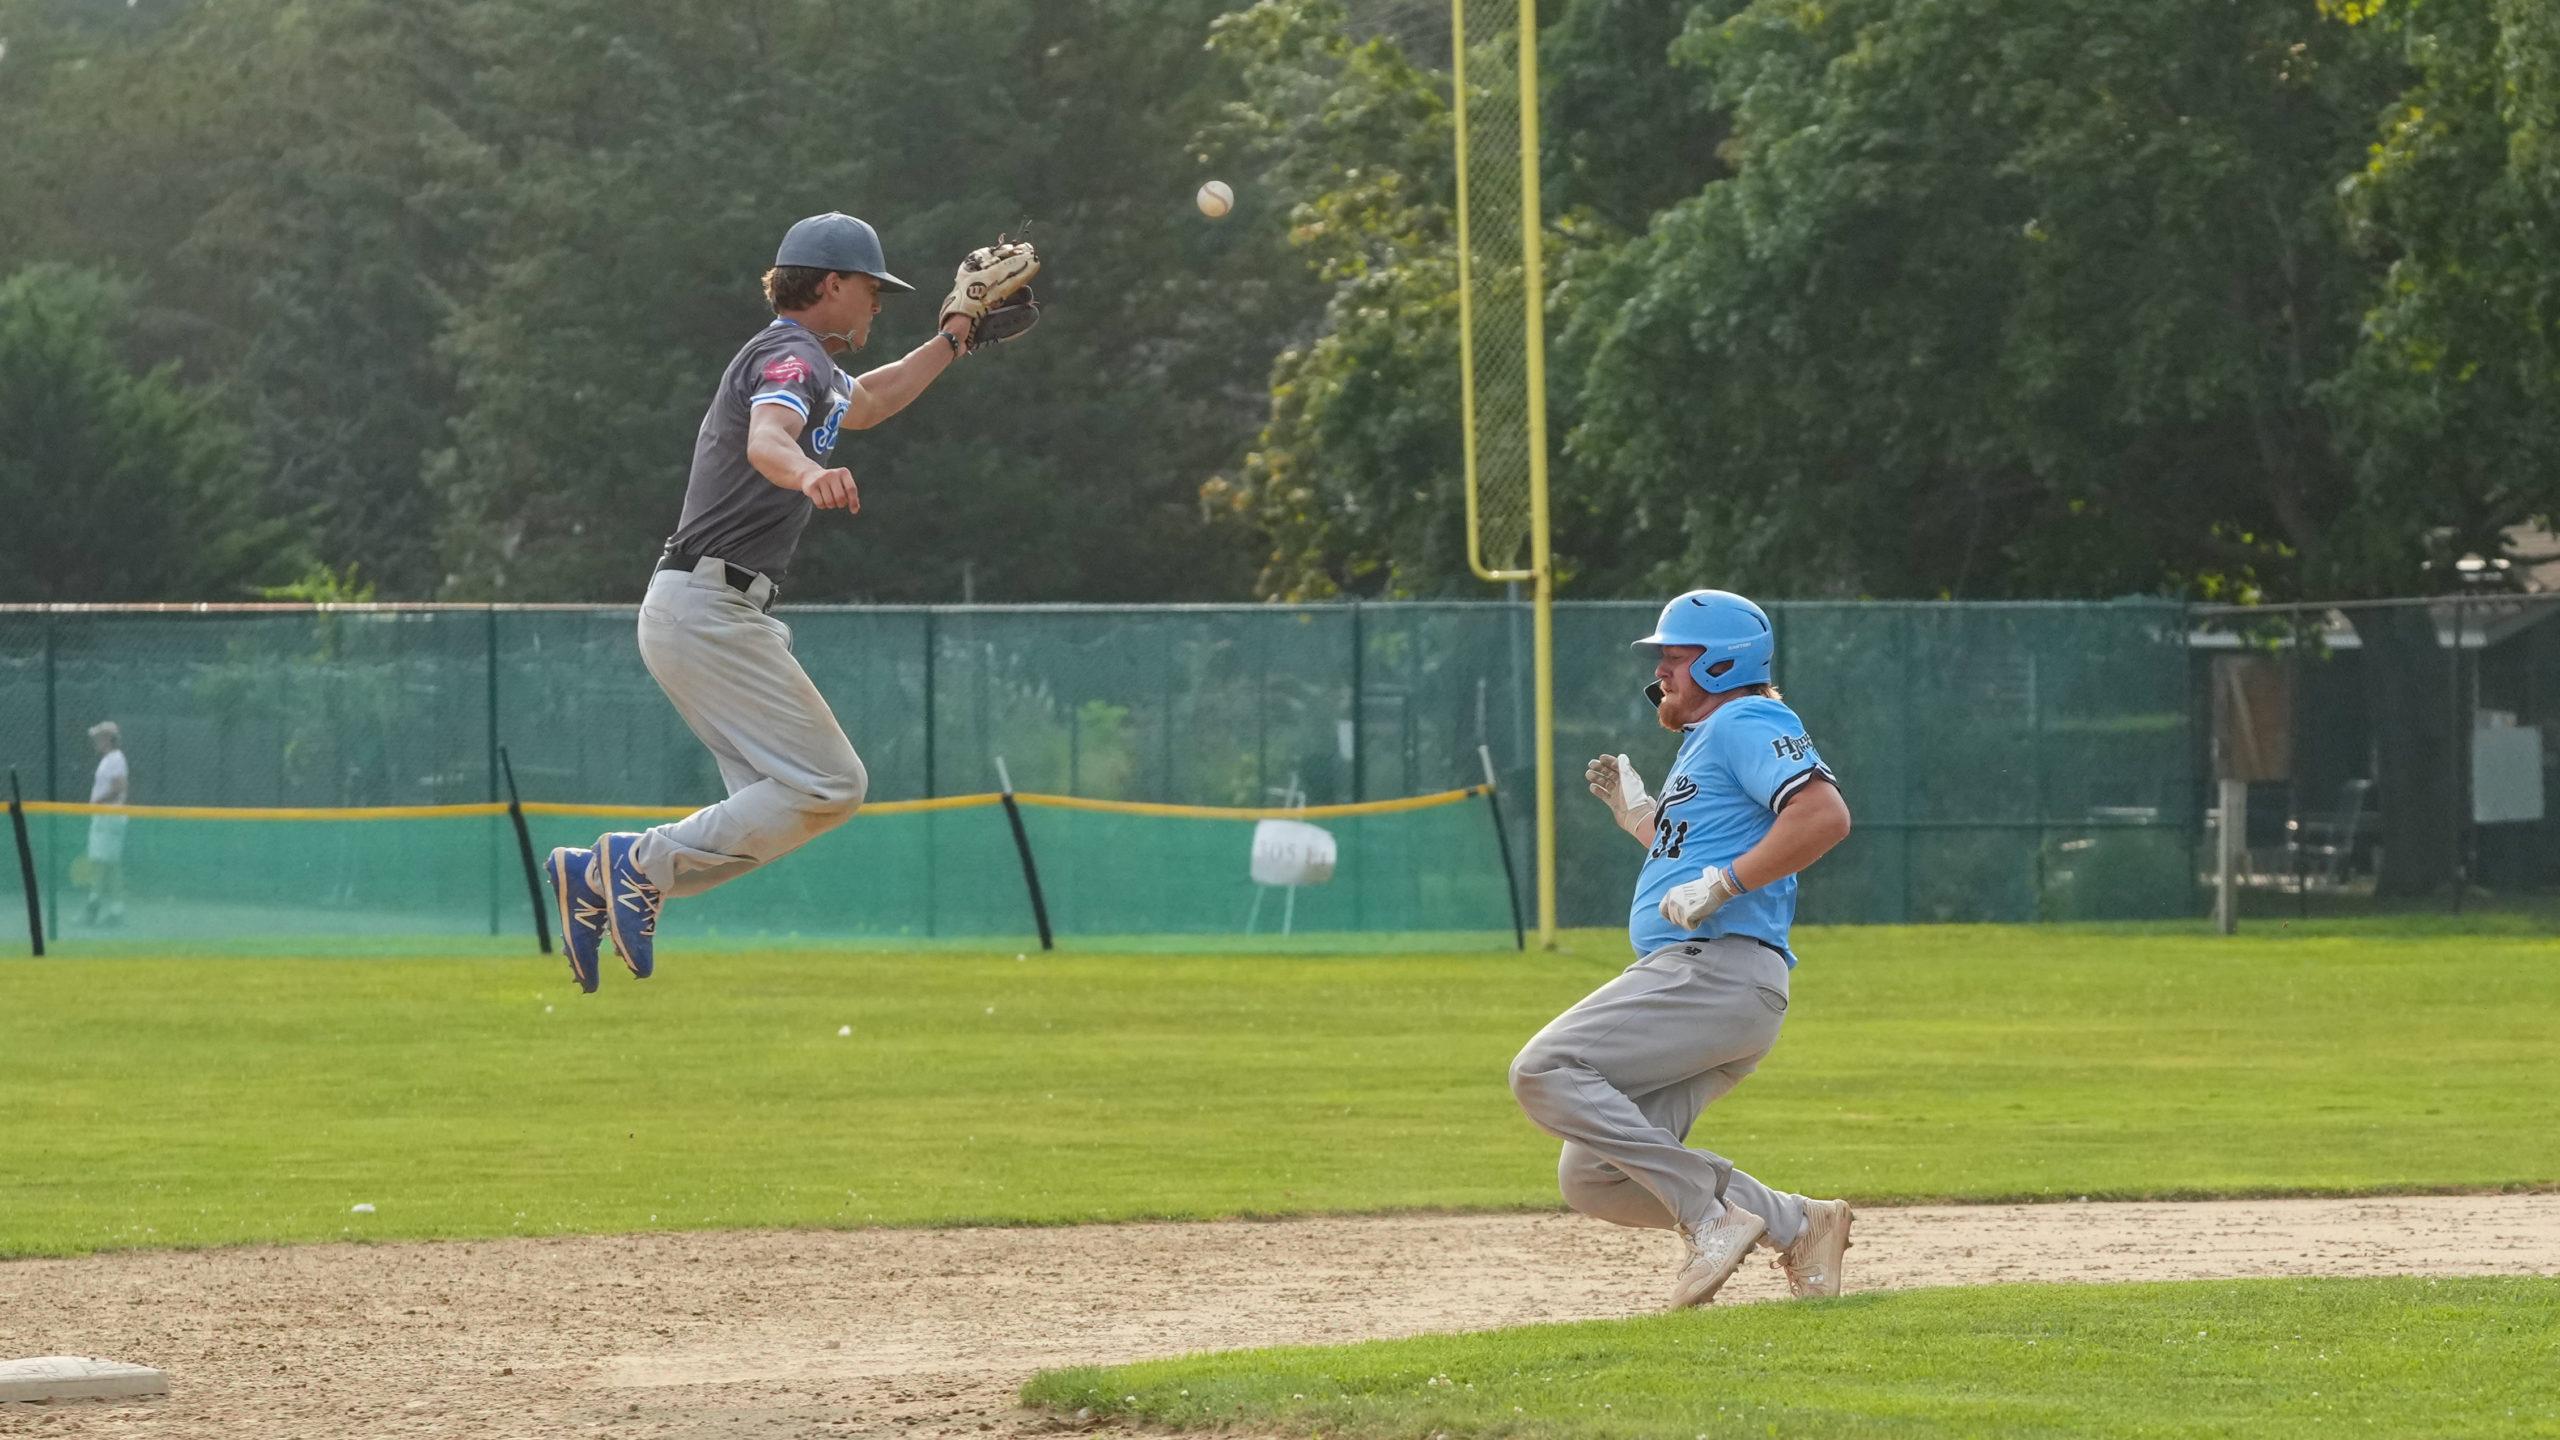 Southampton shortstop Thomas Eitniear (Toledo) leaps out of the way of sliding Sag Harbor Whaler Ryan Mullahey (LIU).